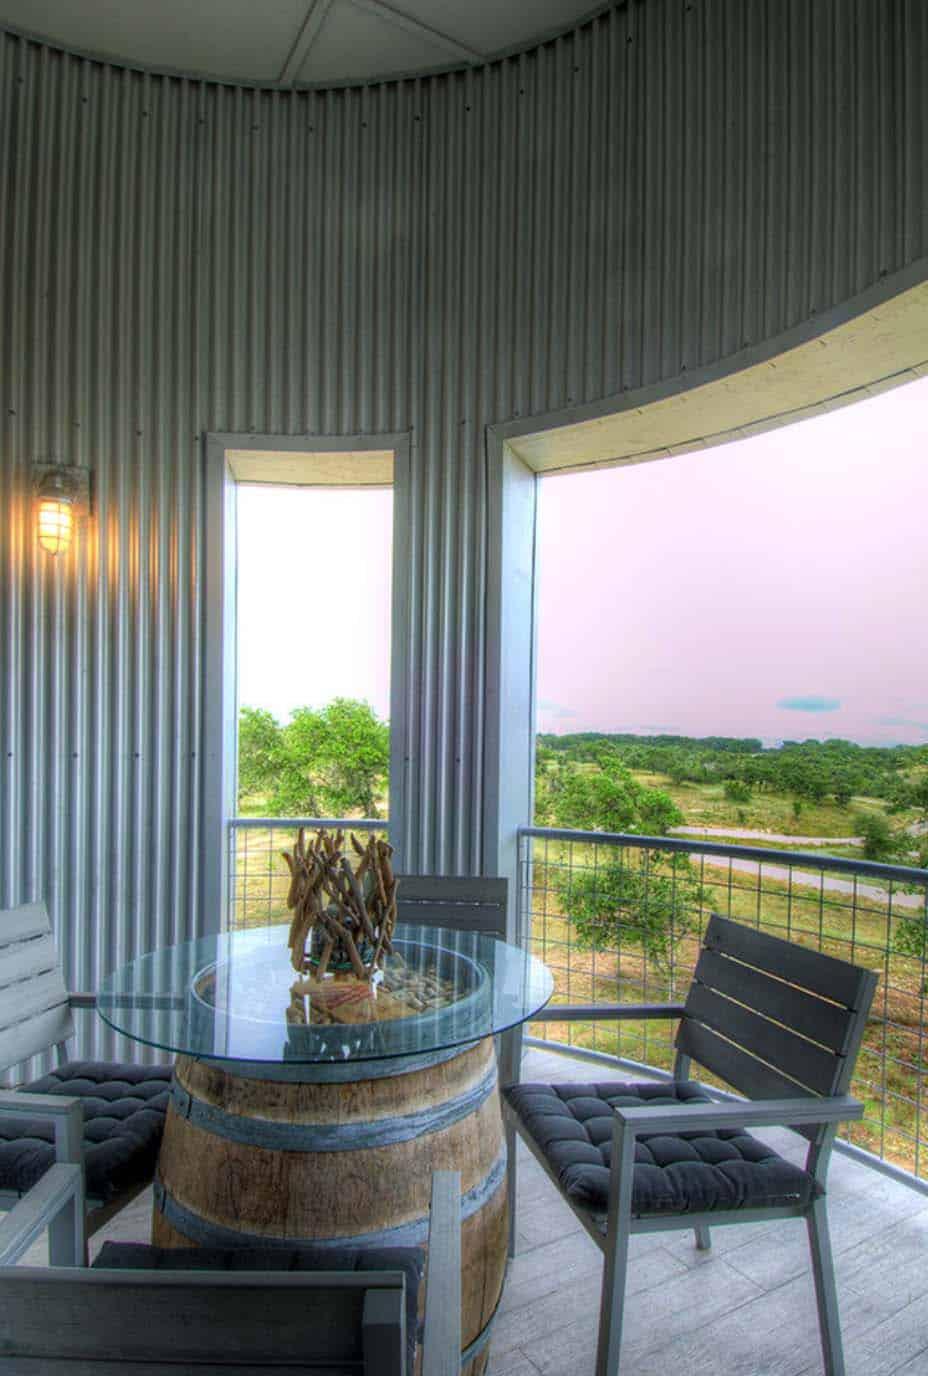 Ranch House-Barn-Burleson Design Group-25-1 Kindesign